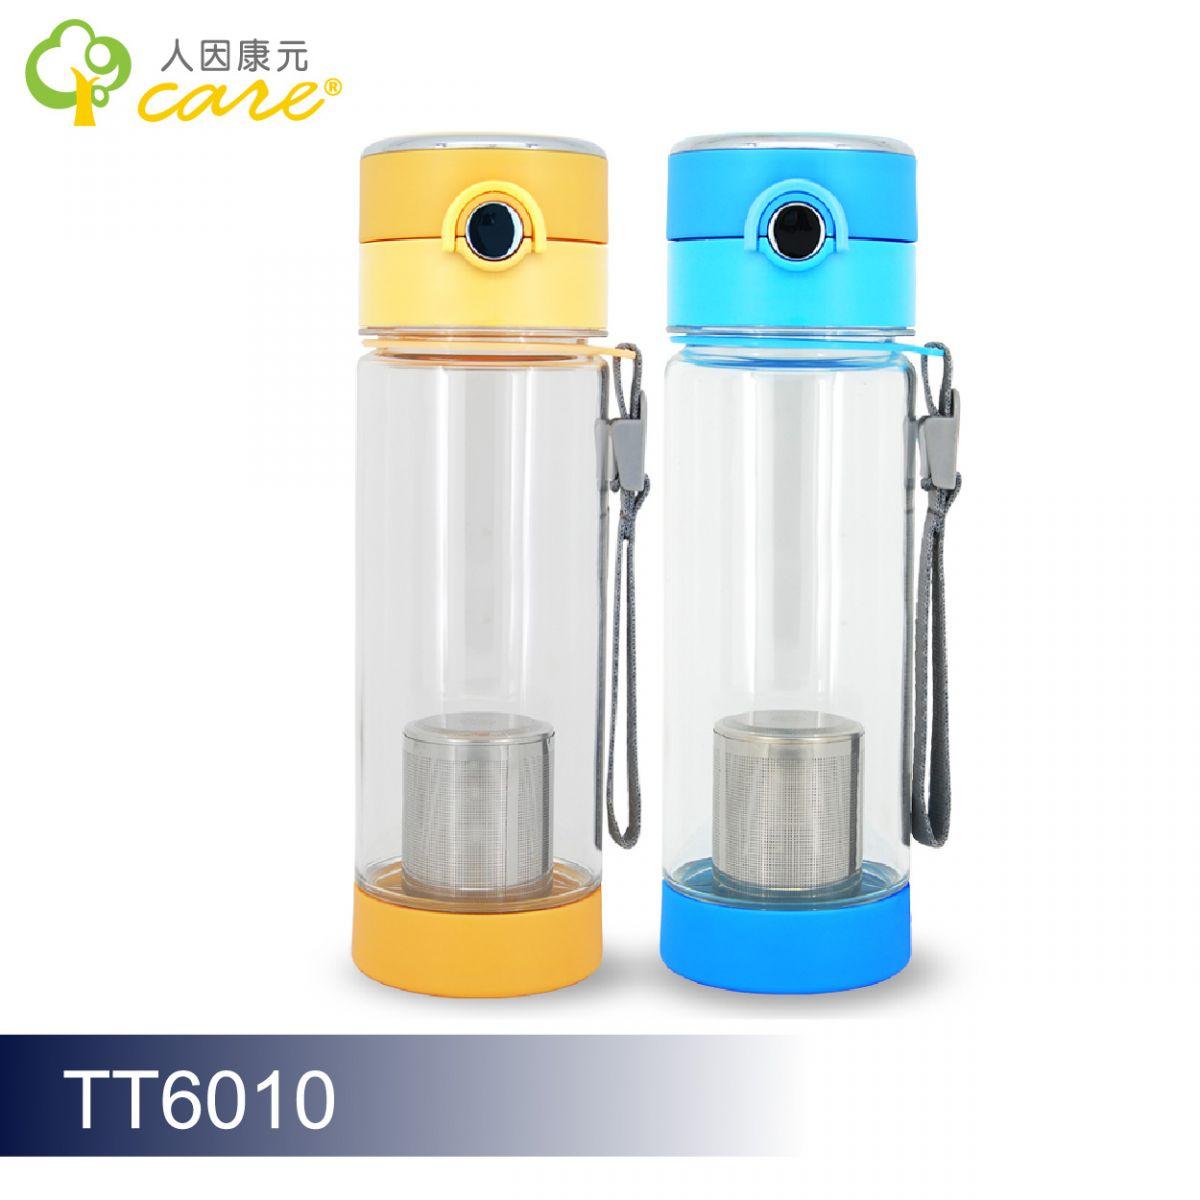 【ErgoCare】新負離子能量創意果茶壺 TT6010B 晴空藍 600ml